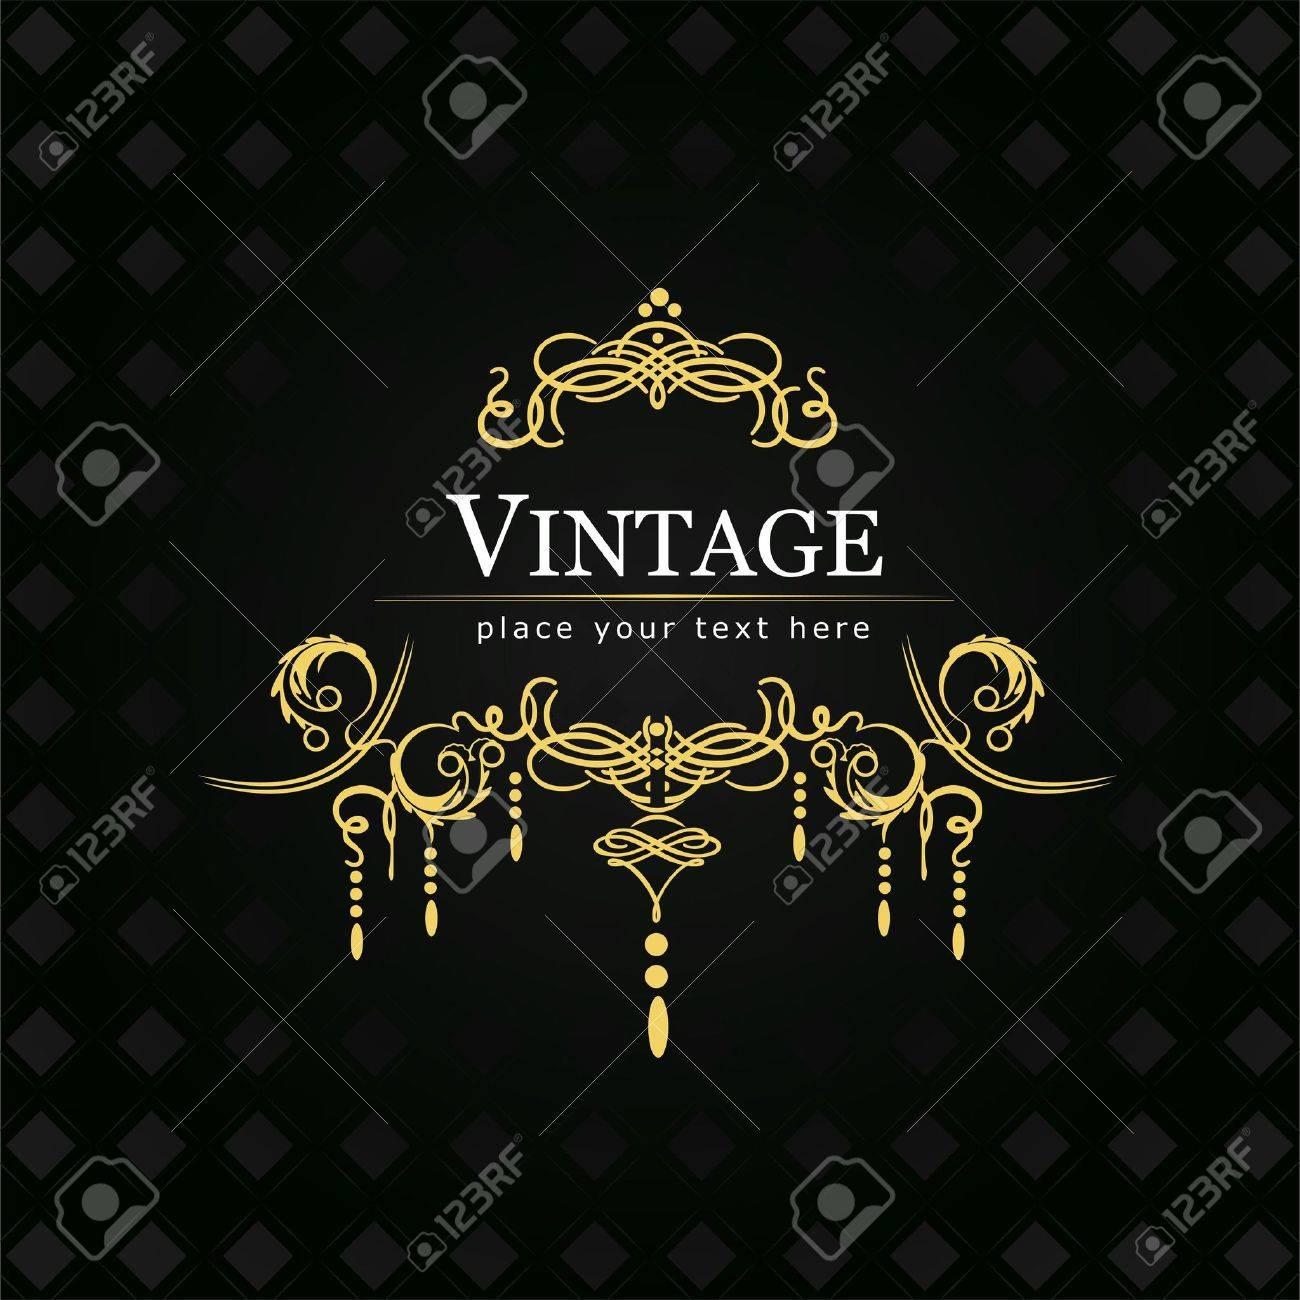 Invitation vintage card Wedding or Valentine s Day - 14829573